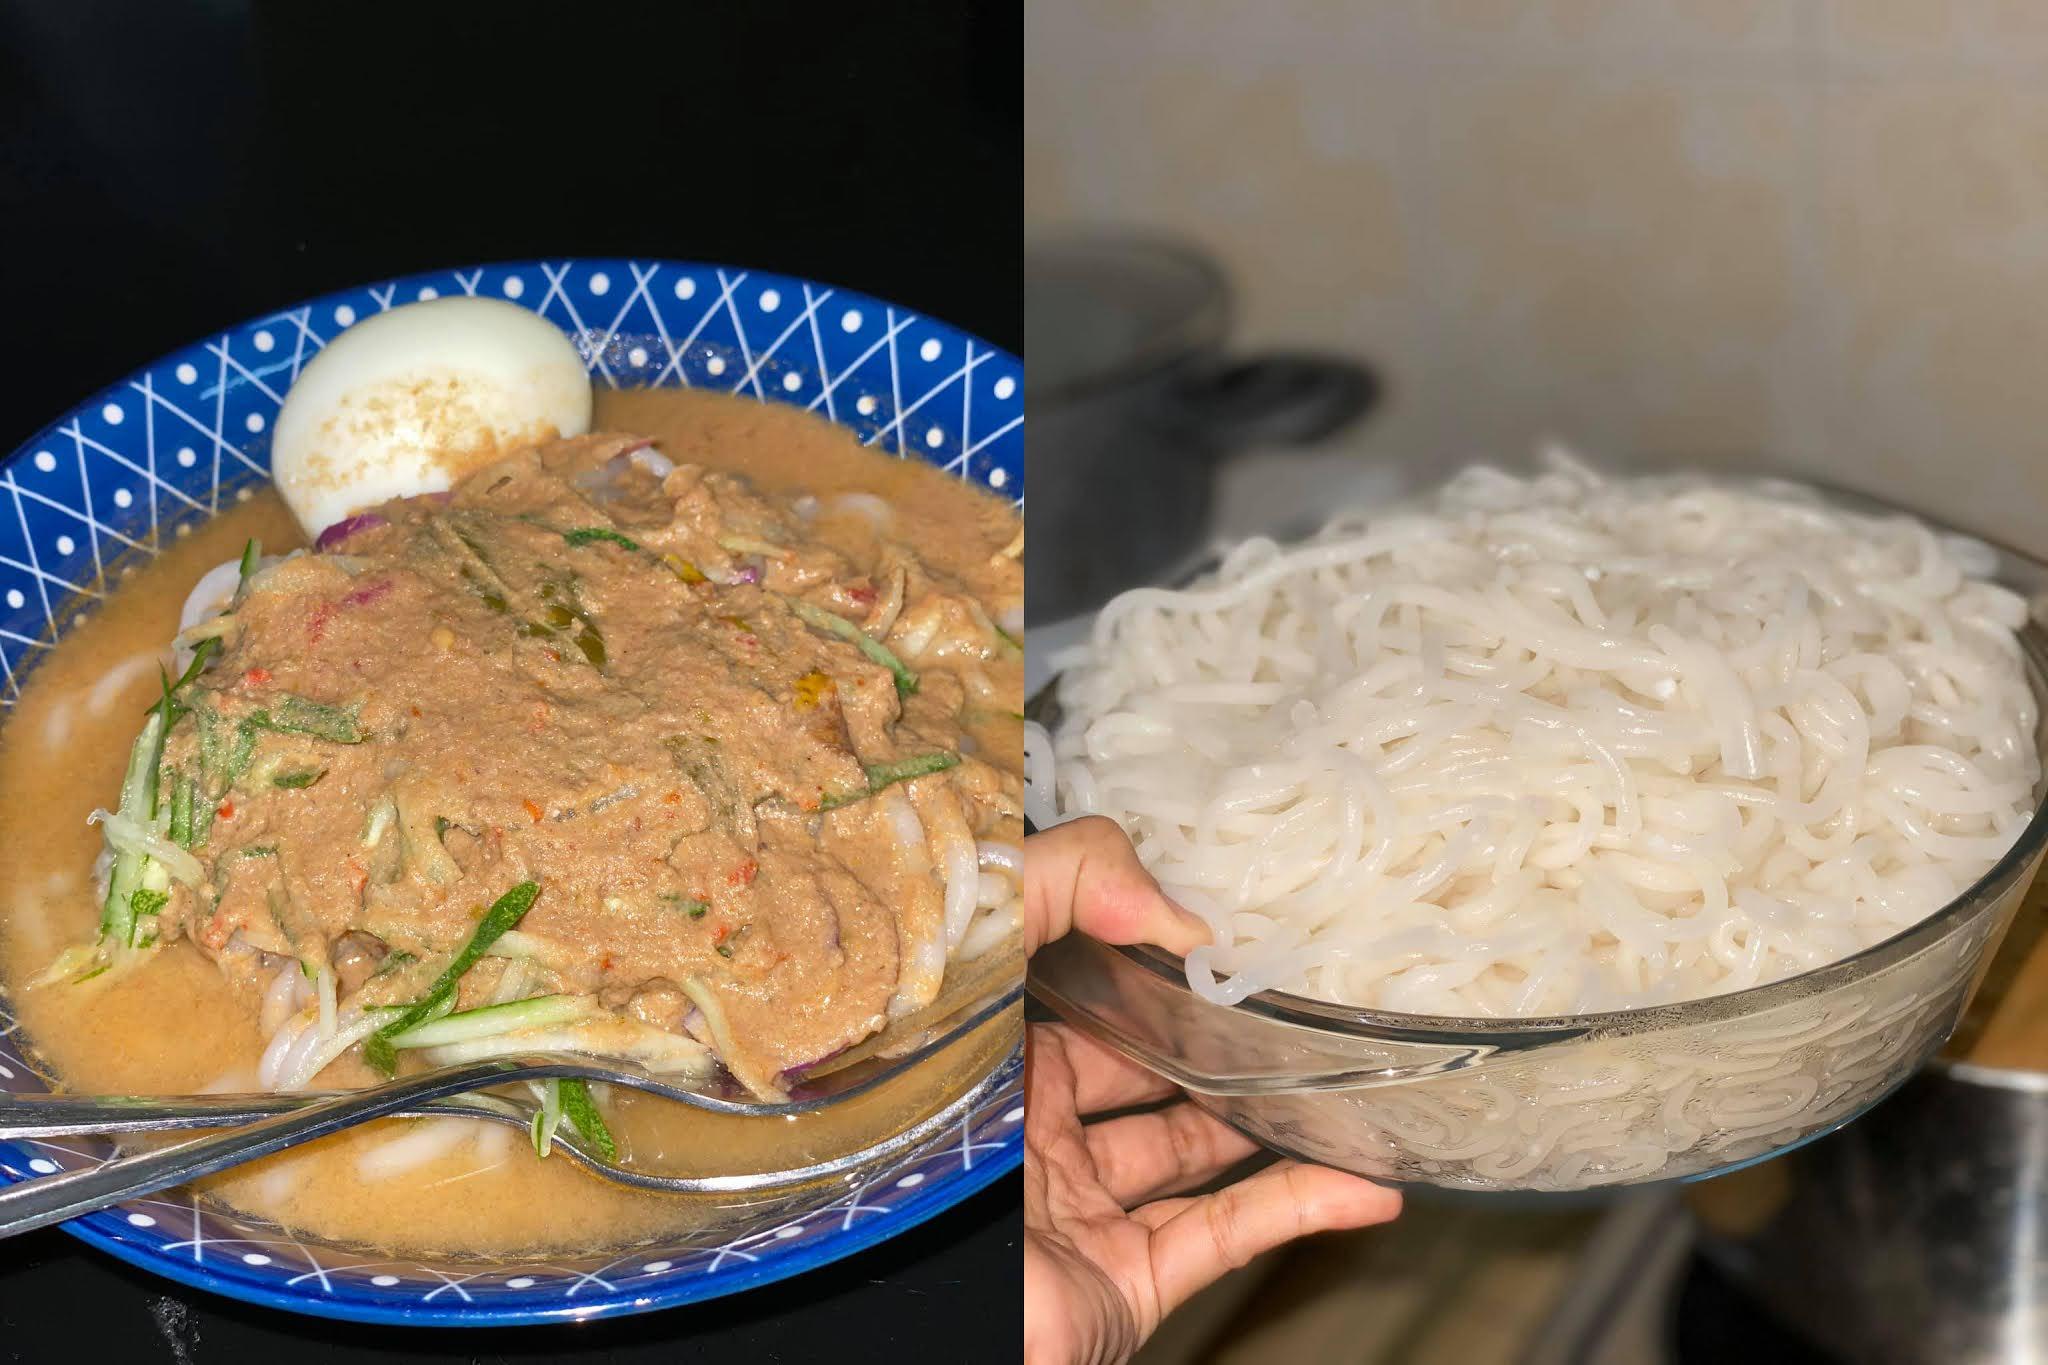 cara masak dan resepi laksa 2020